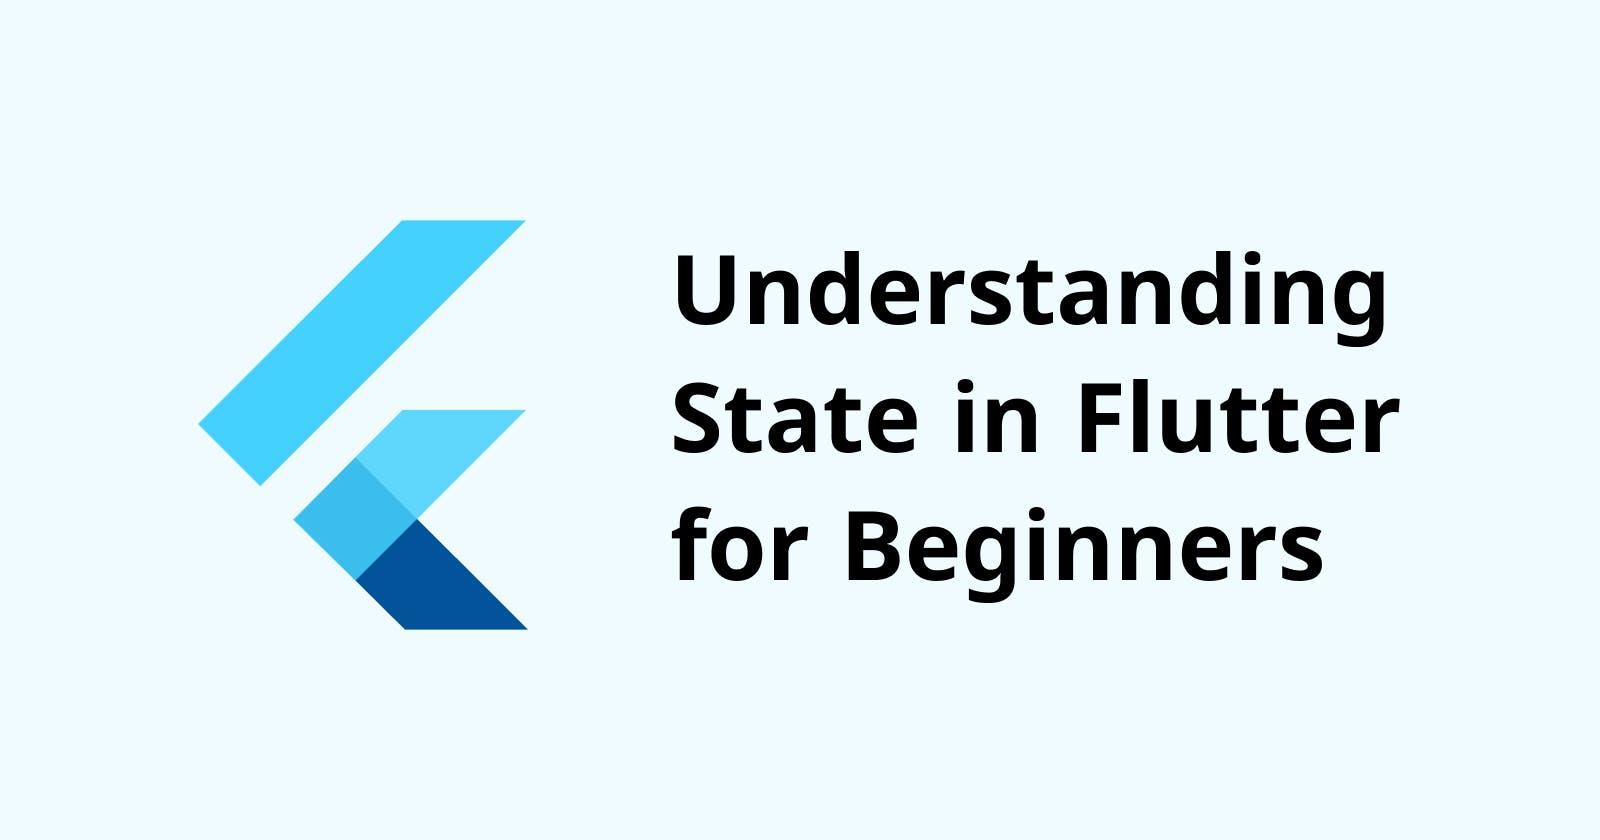 Understanding State in Flutter for Beginners